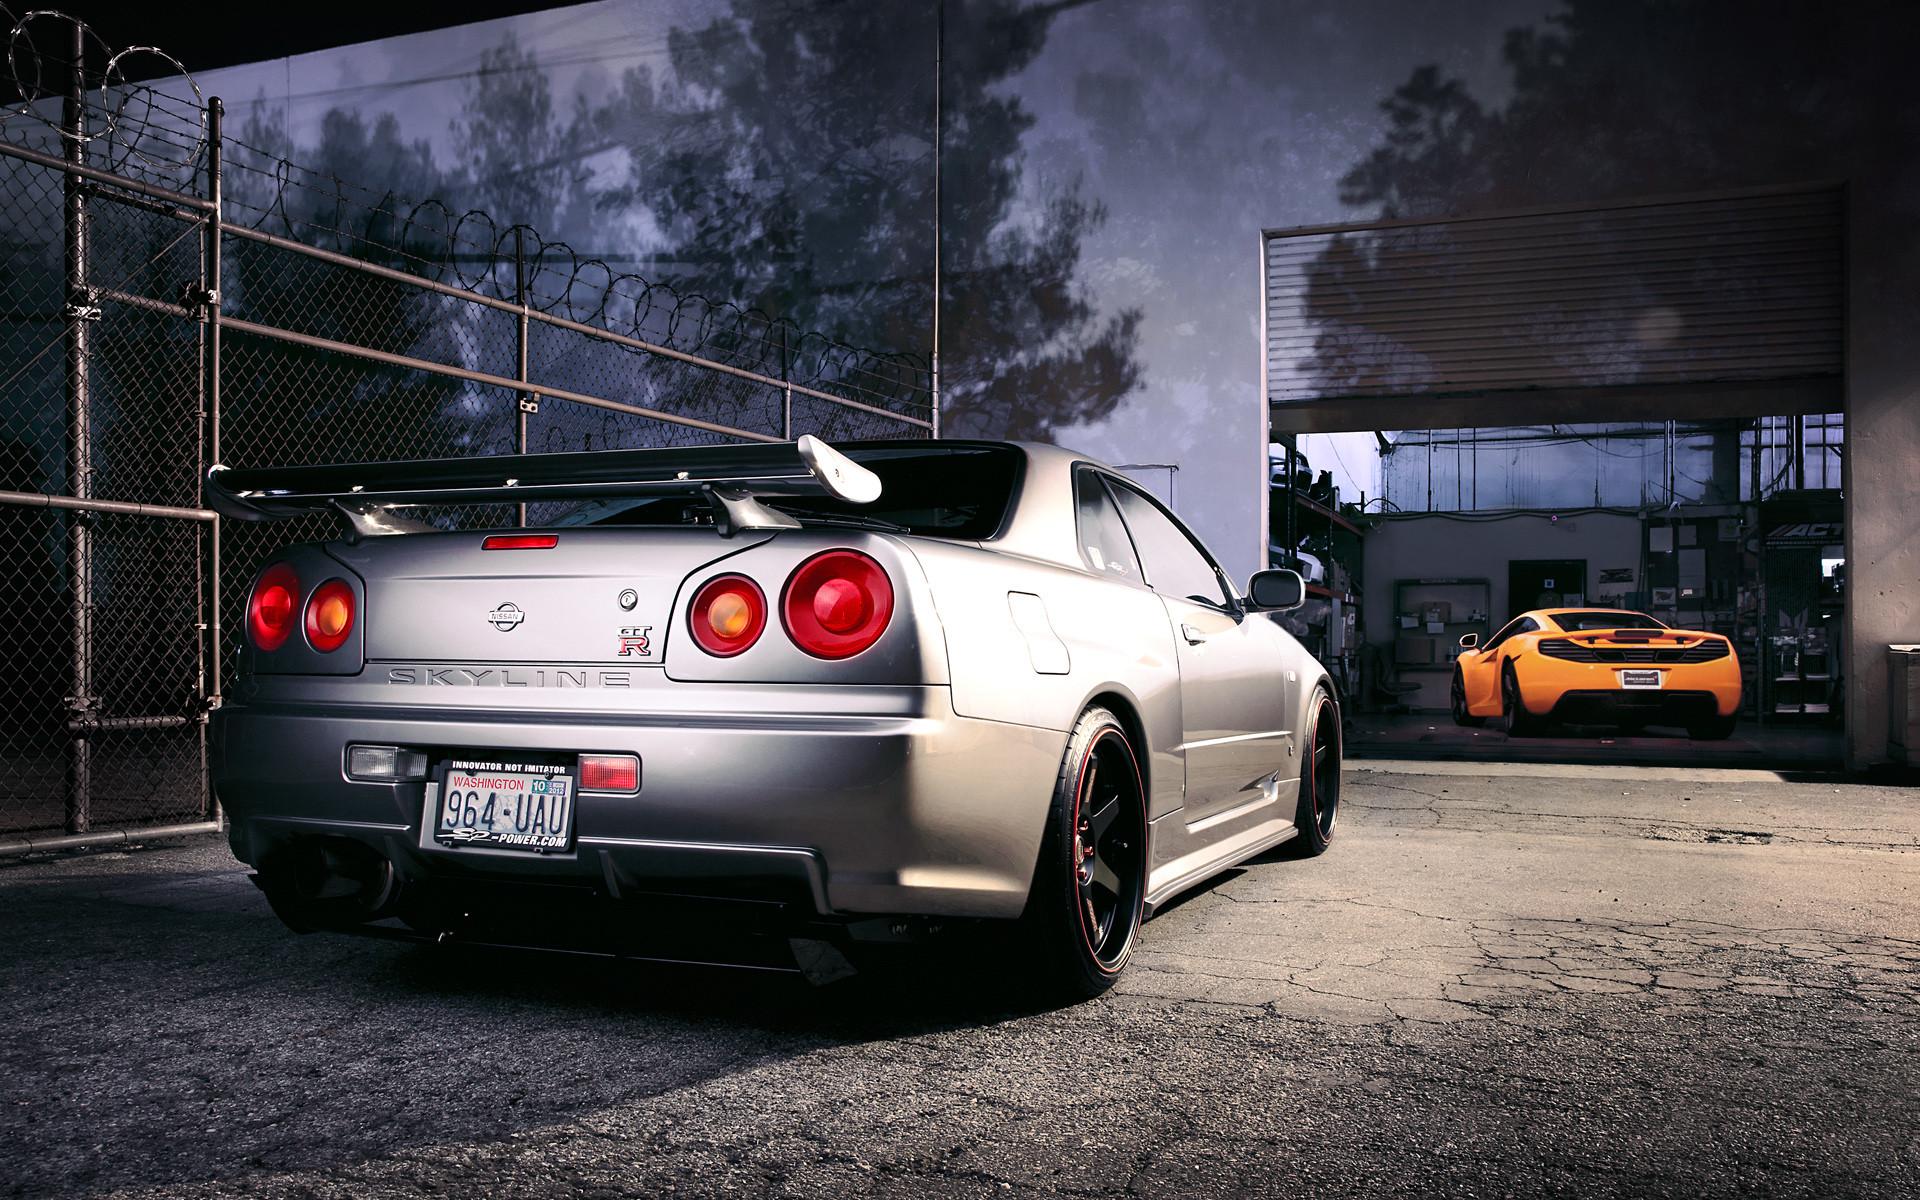 1920x1200 Nissan R34 Skyline GT R · Download · 1920x1080 ...